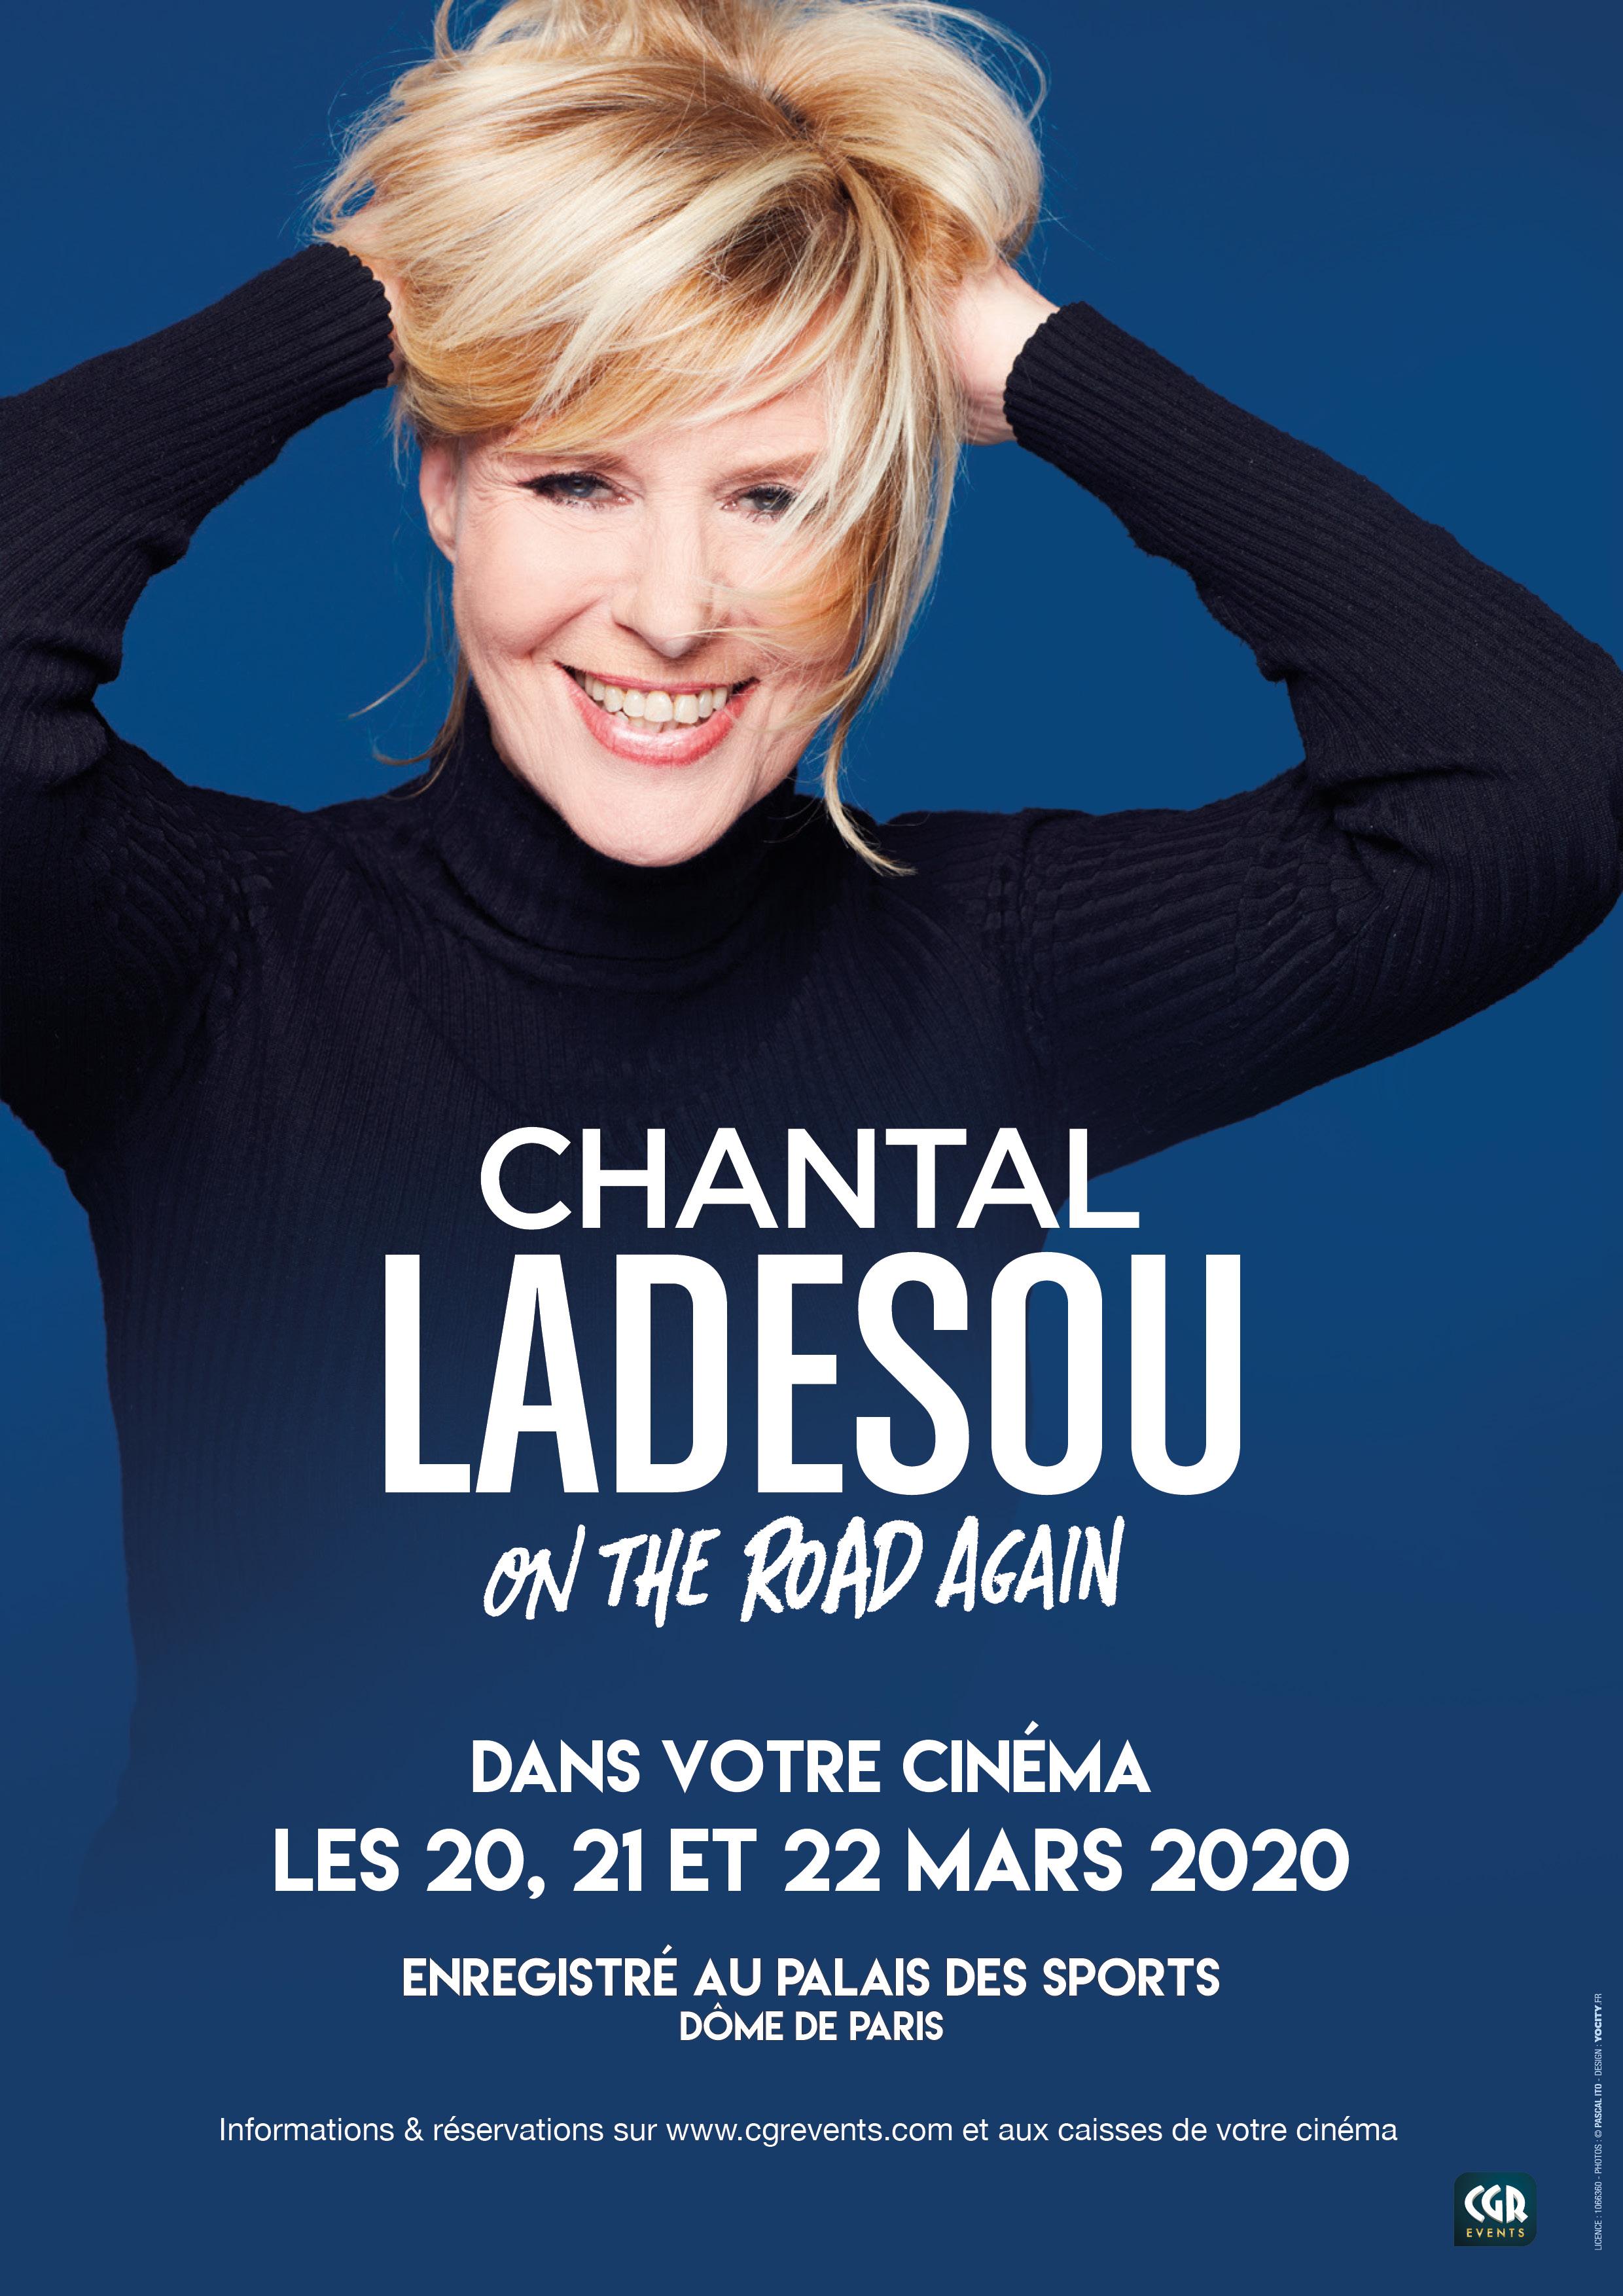 Image du film Chantal Ladesou - On the road again